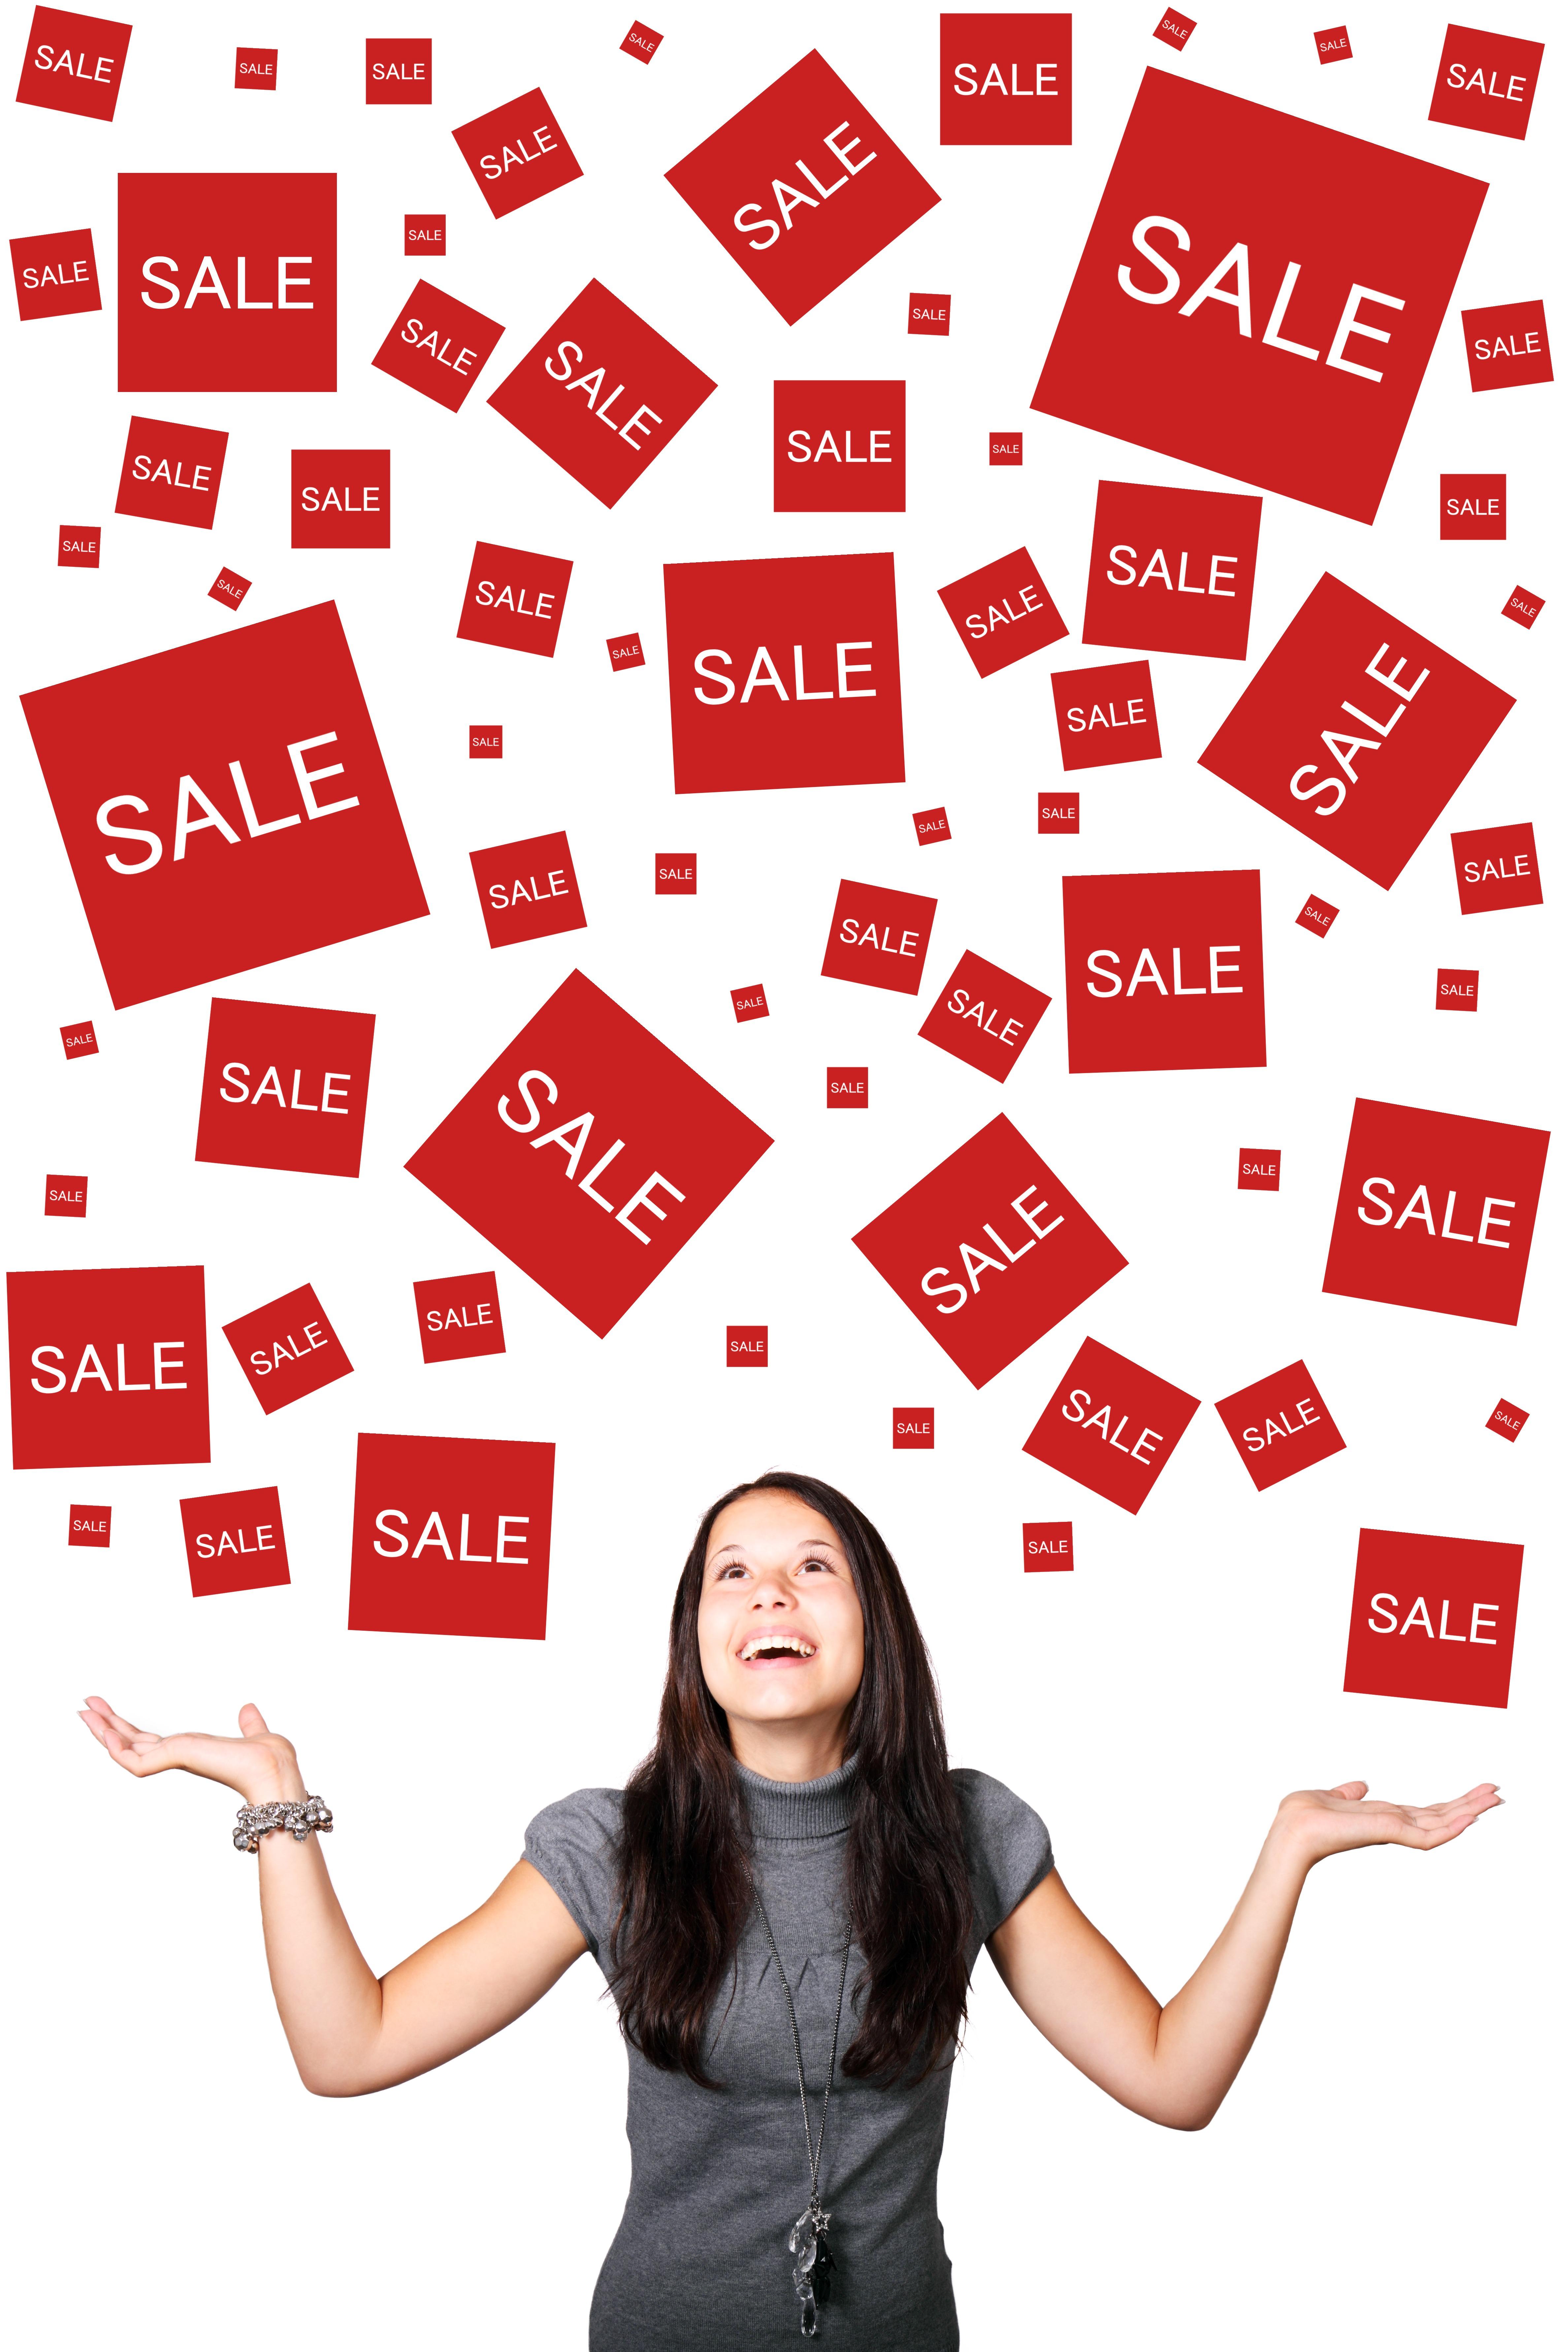 Sale, Activity, Buy, Girl, Human, HQ Photo